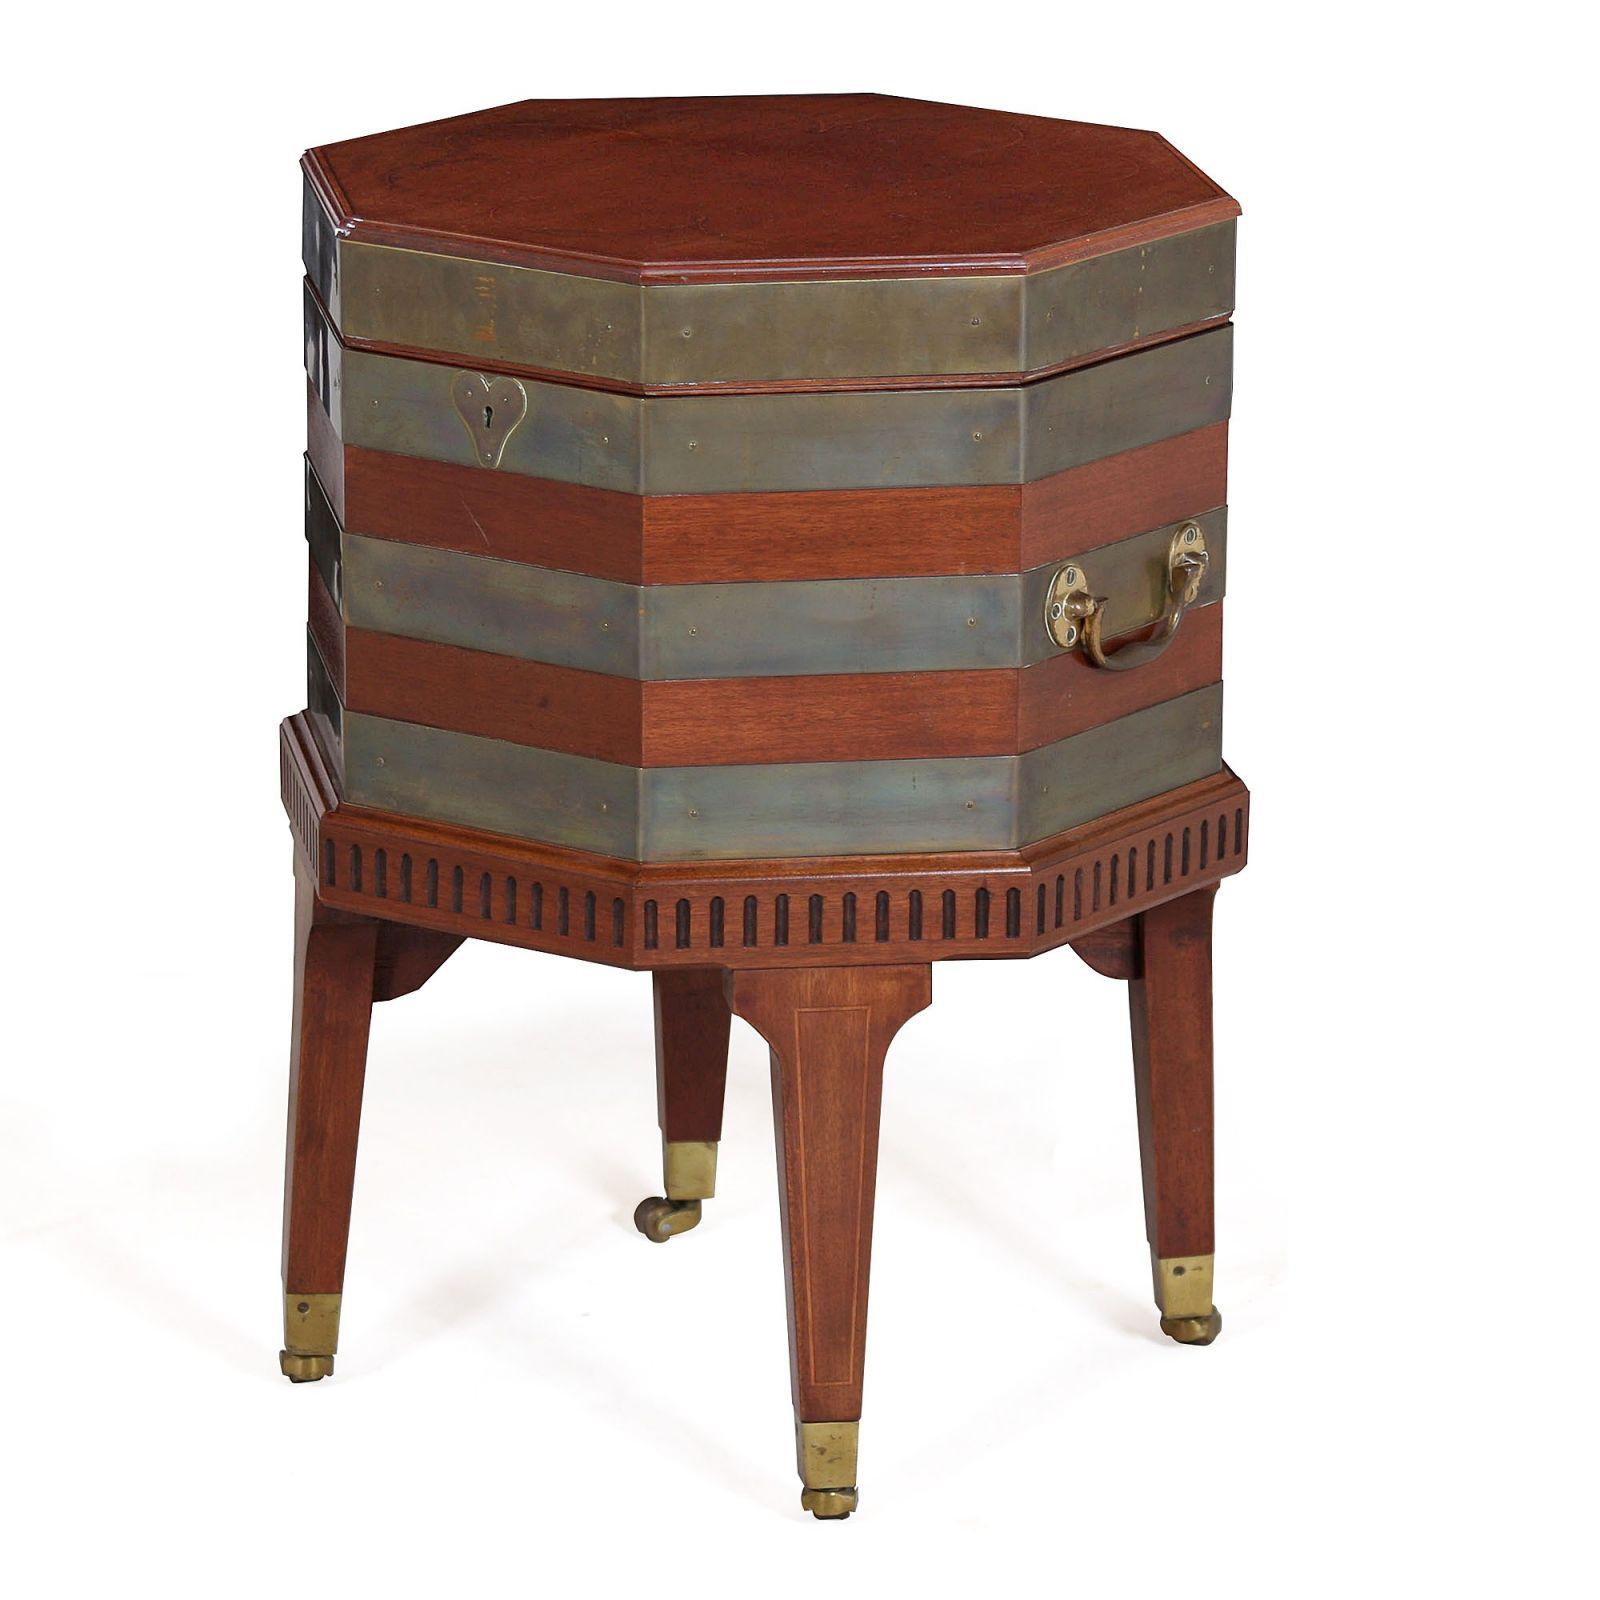 Octagonal wine box on stand